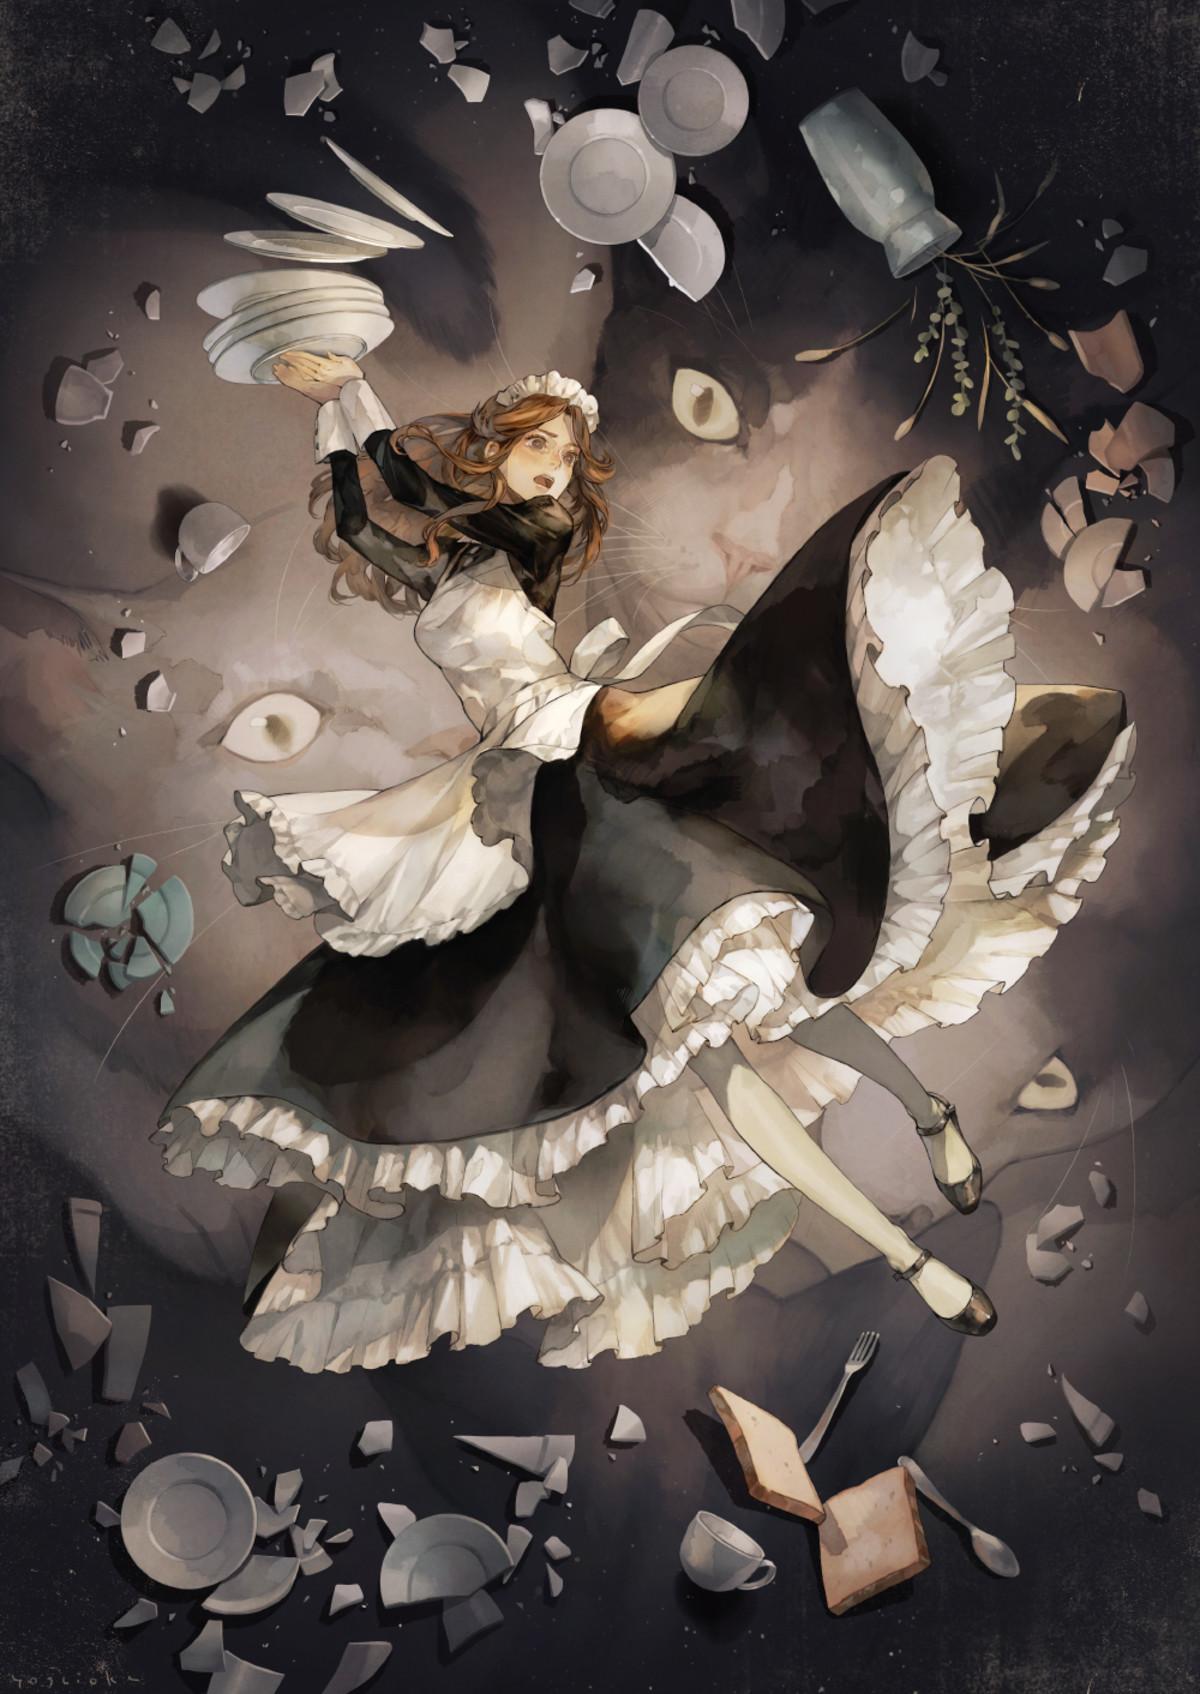 Maid March part 11. join list: SplendidServants (486 subs)Mention History join list:. helose canichaikait